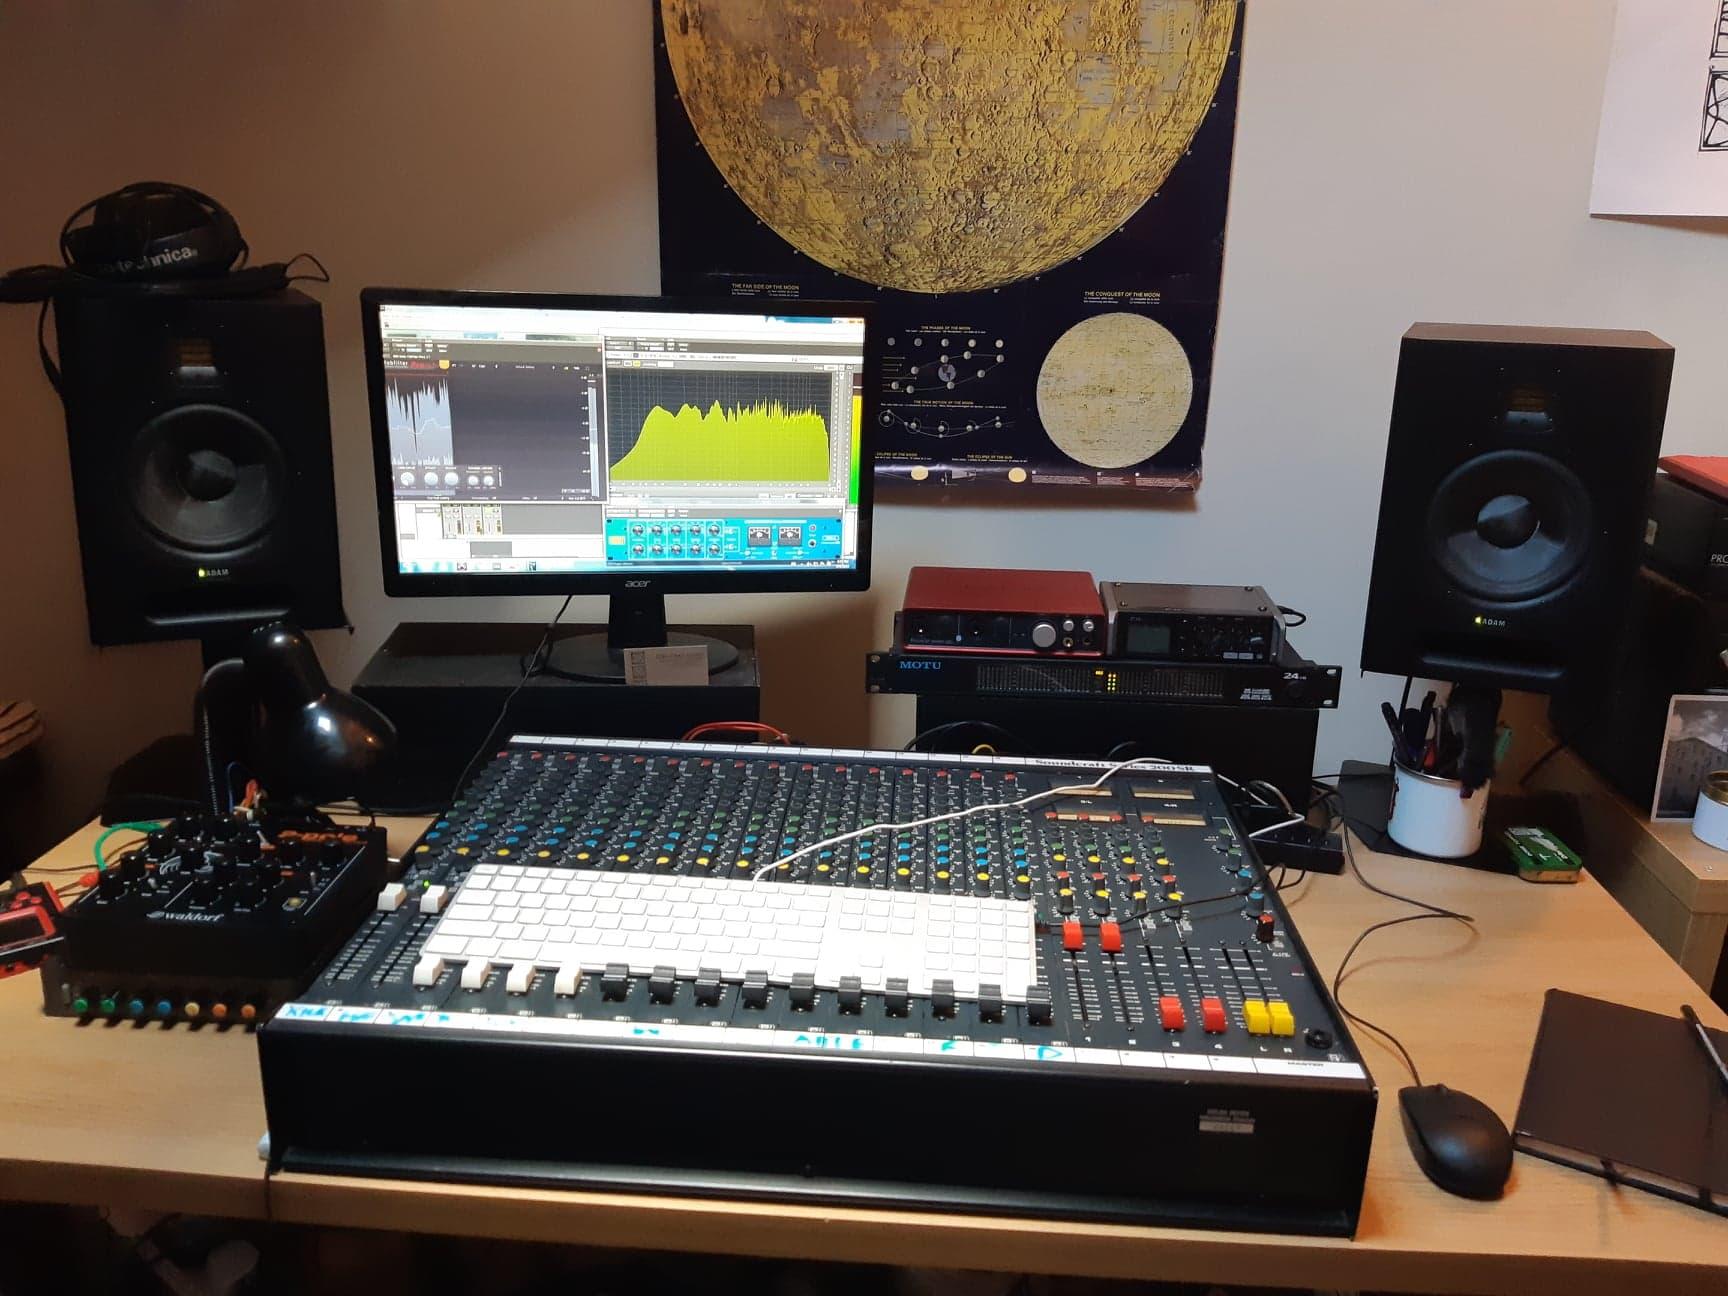 hydra sound recording studio